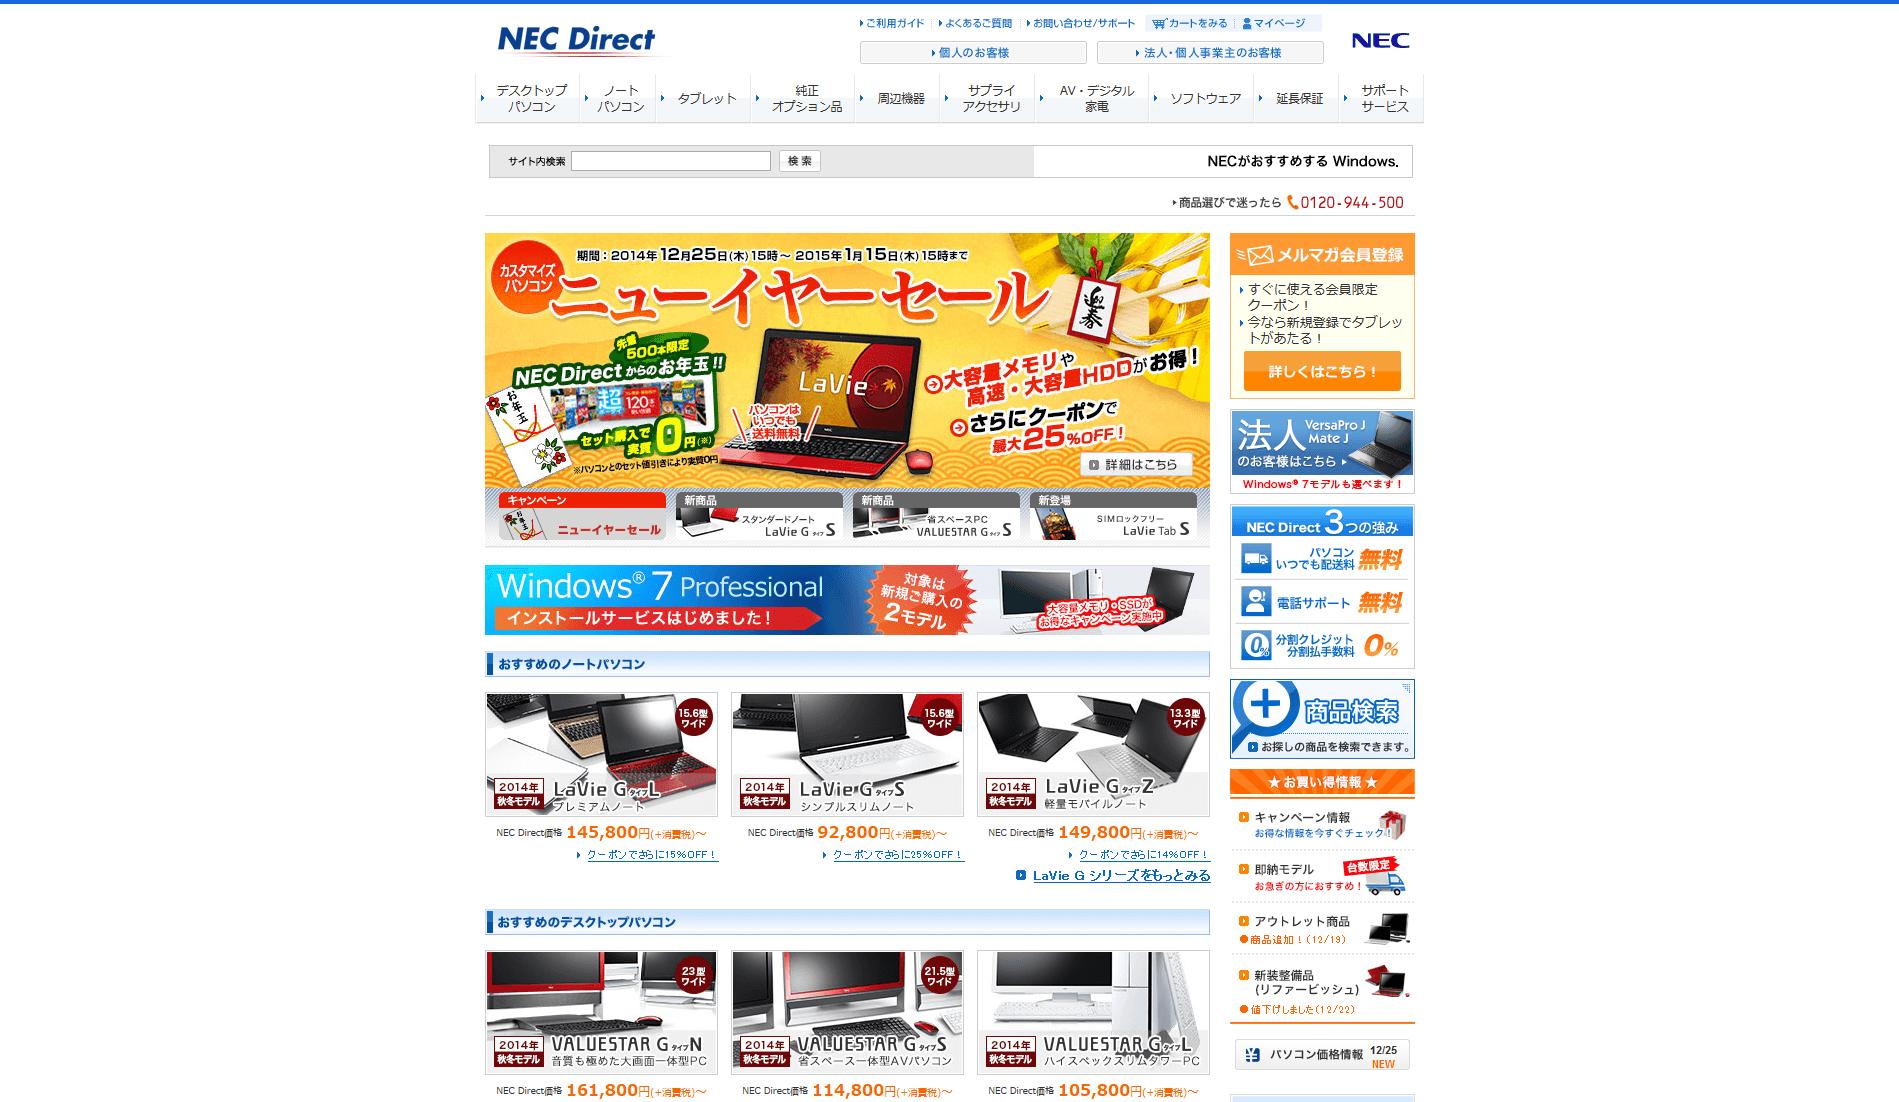 NEC Direct(NECダイレクト) パソコン ノートパソコン(LaVie) デスクトップ(VALUESTAR) パソコン 販売・購入